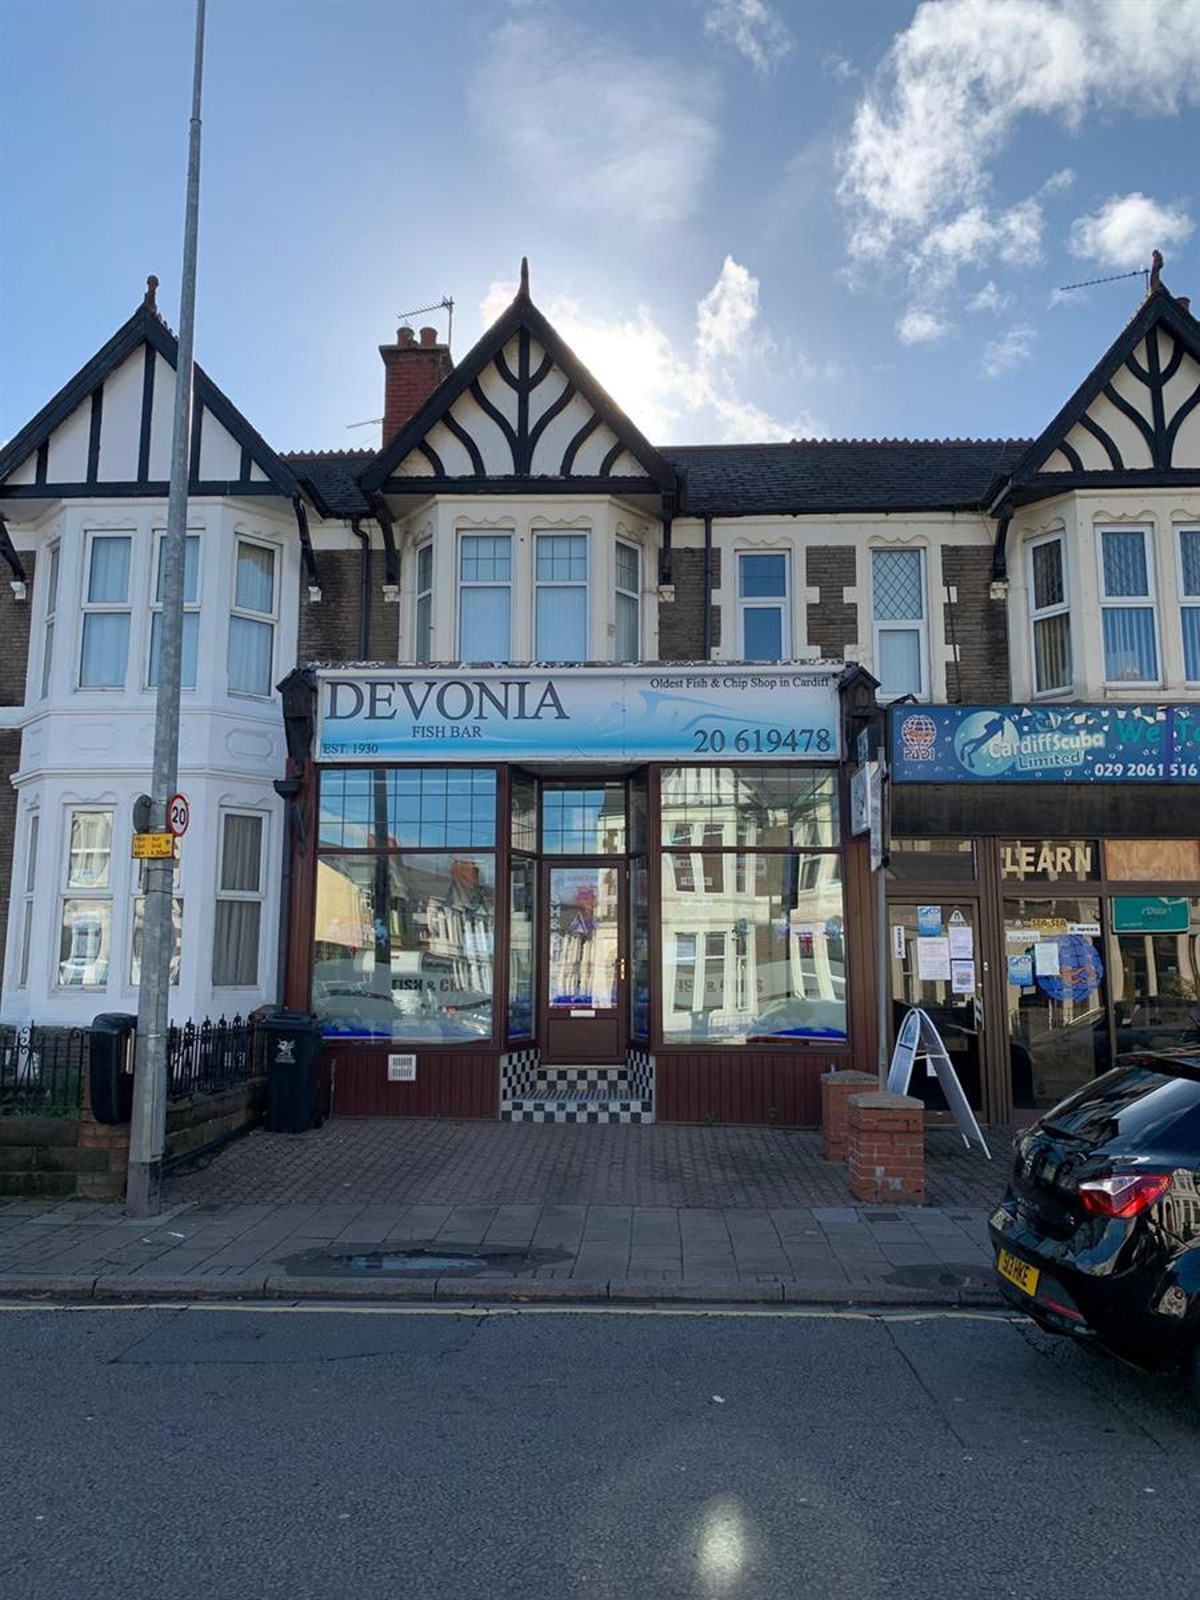 Devonia Fish Bar,  Whitchurch Road, Cardiff